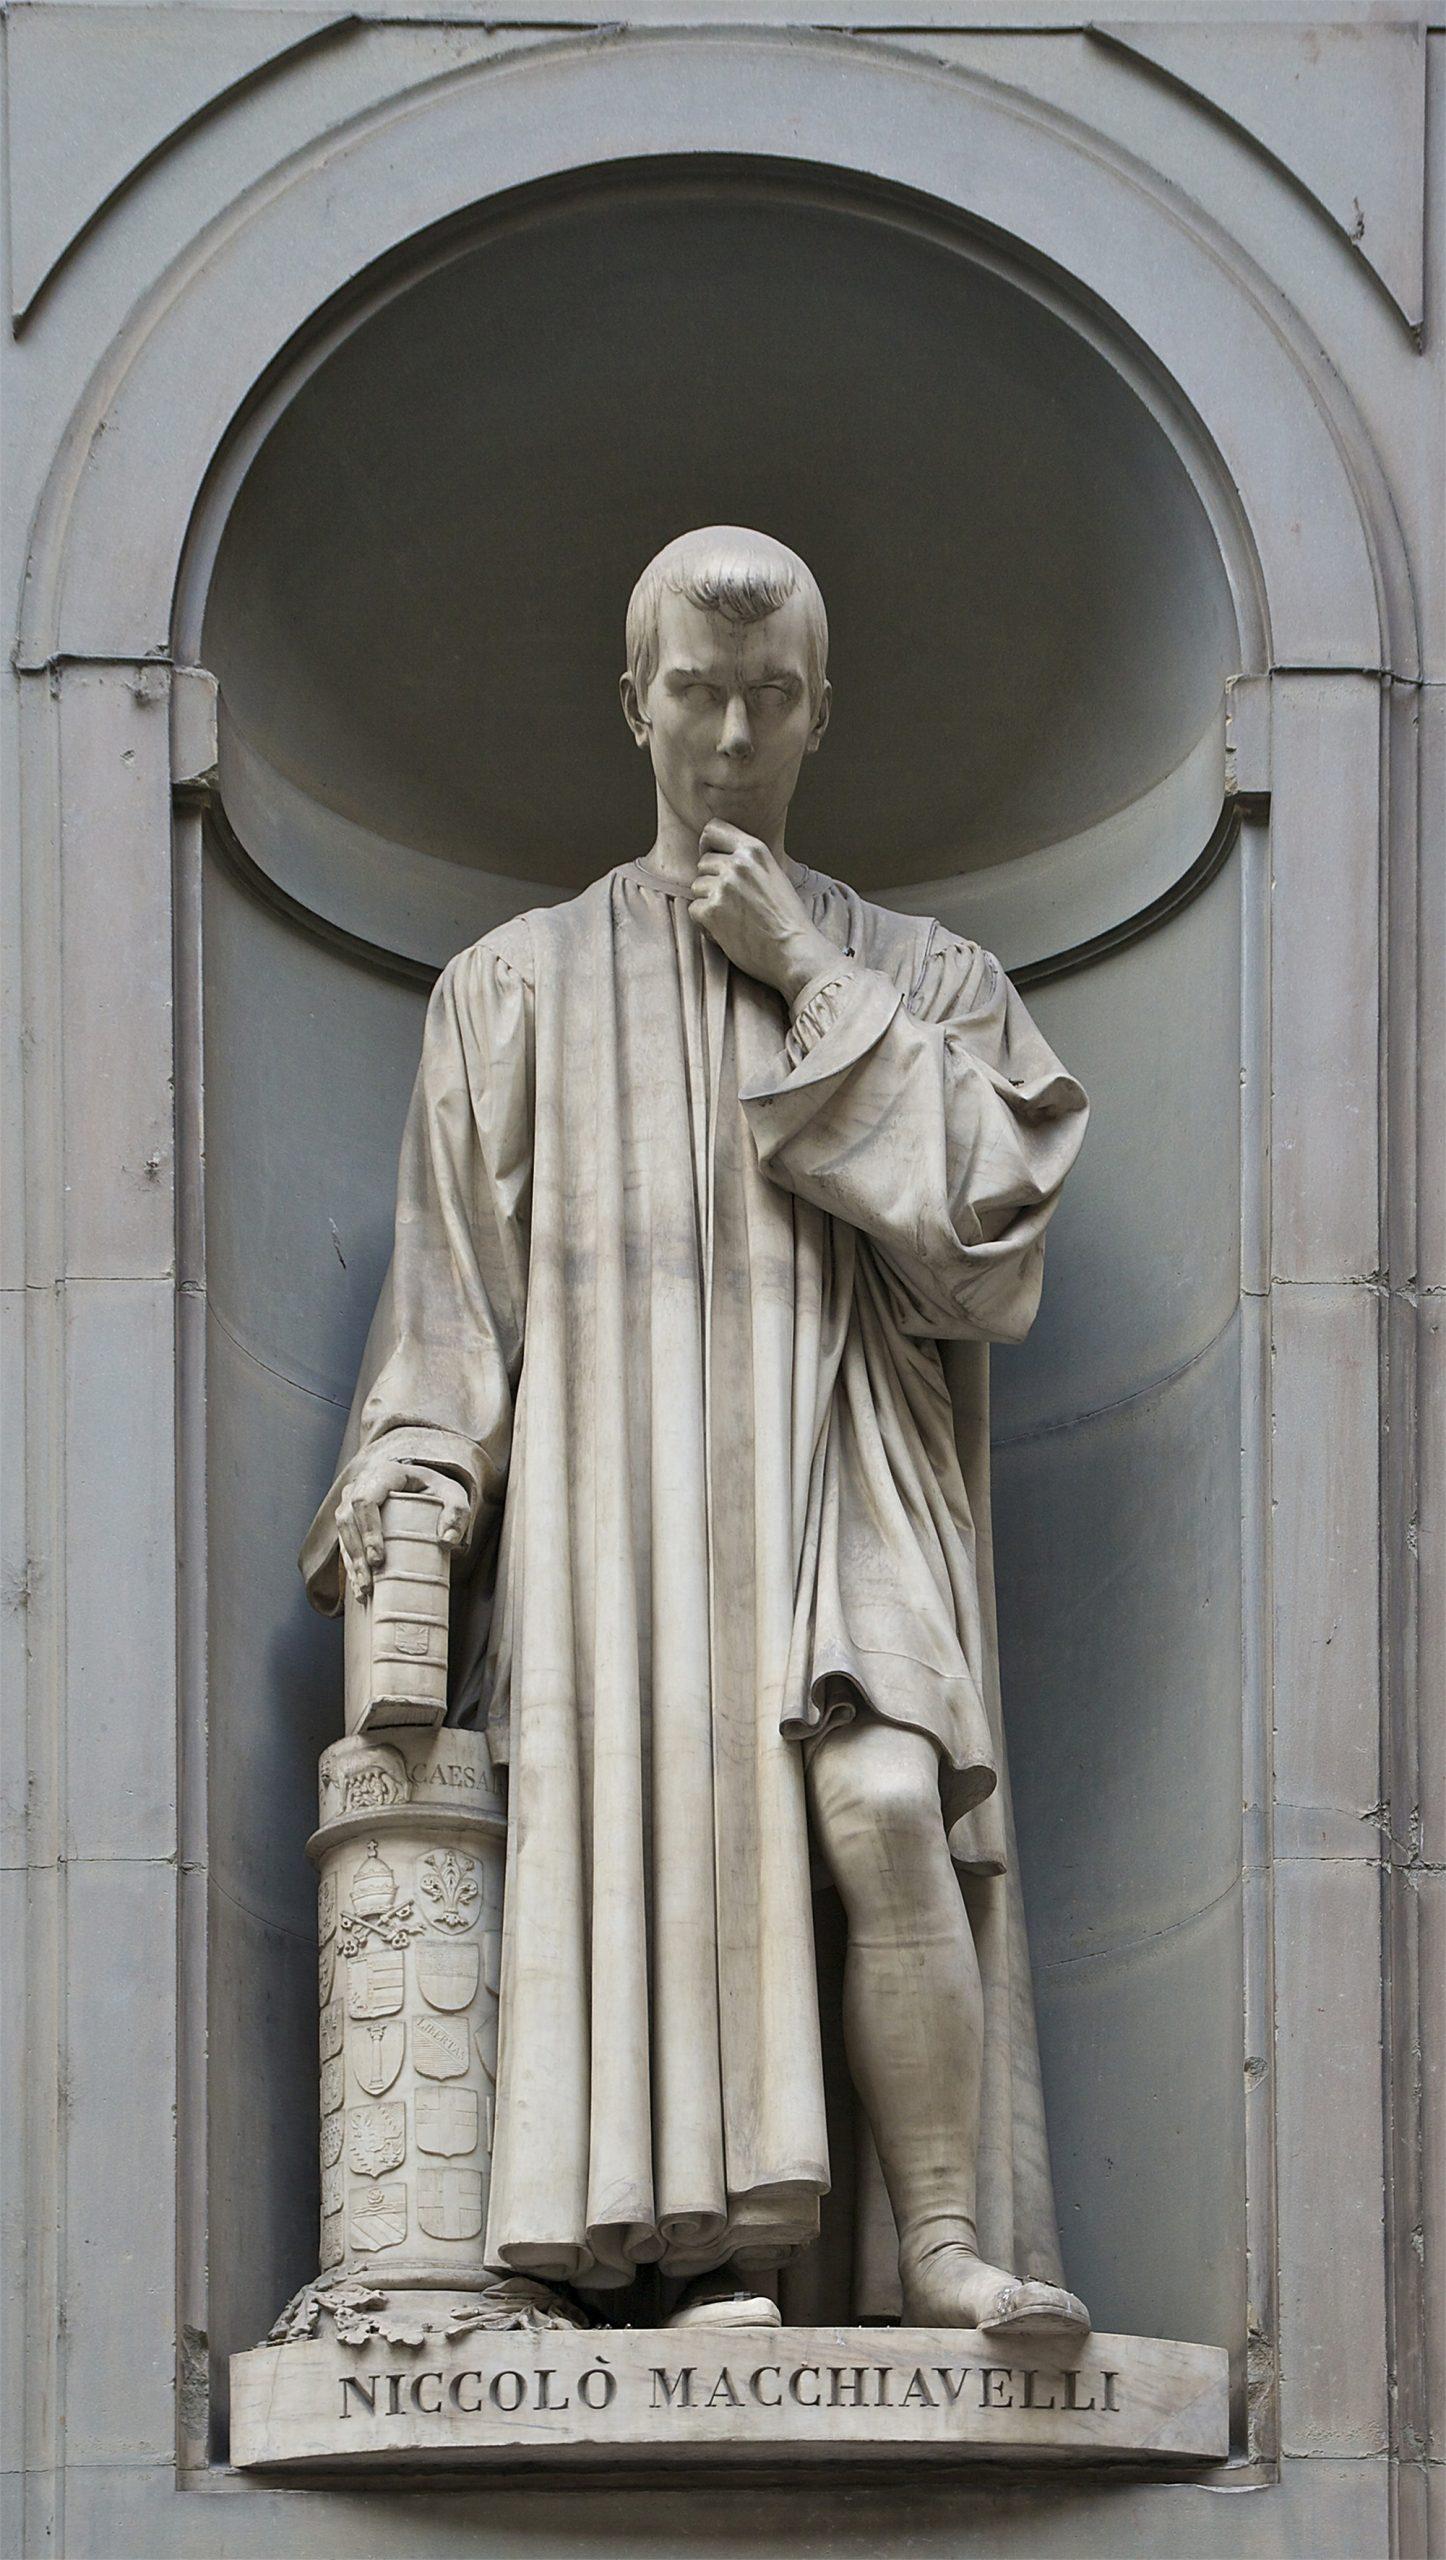 Statue of Niccolò Macchiavelli